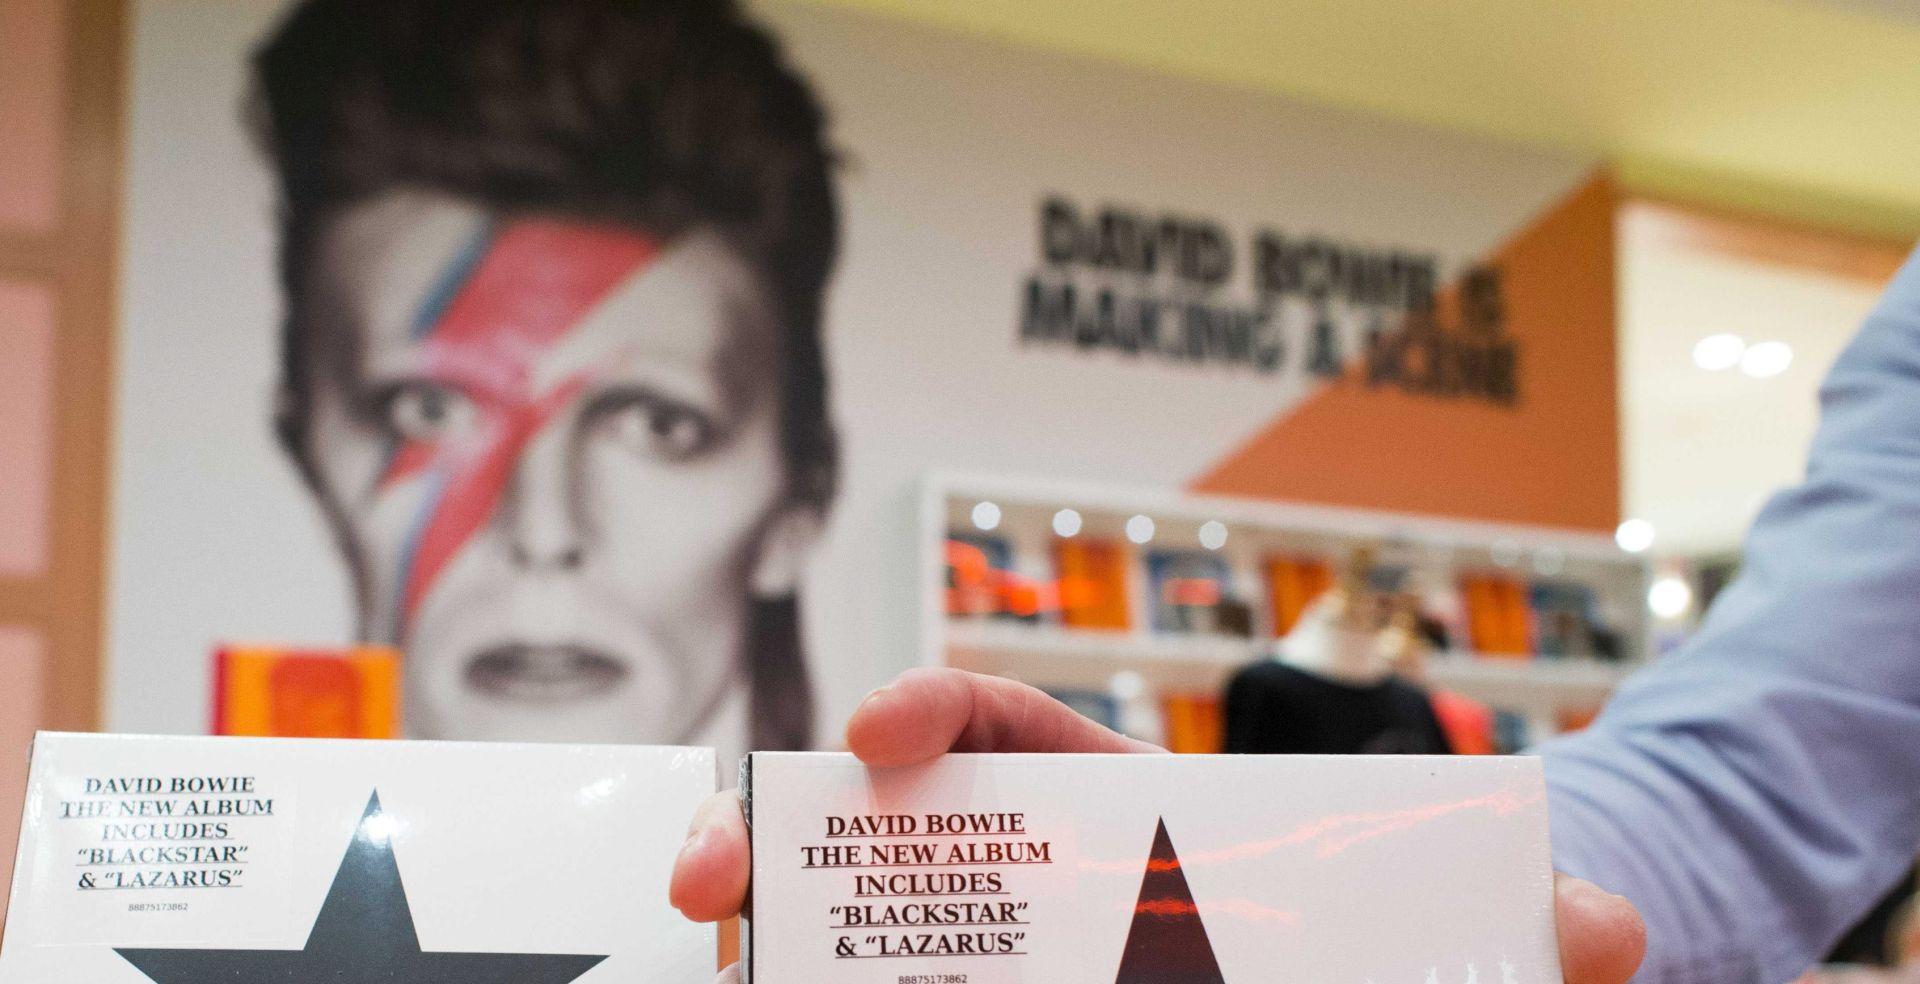 "SJAJNA PRODAJA ""BLACKSTARA"" Novi album Davida Bowieja na vrhu ljestvica, očekuje se i bolja prodaja starih albuma"